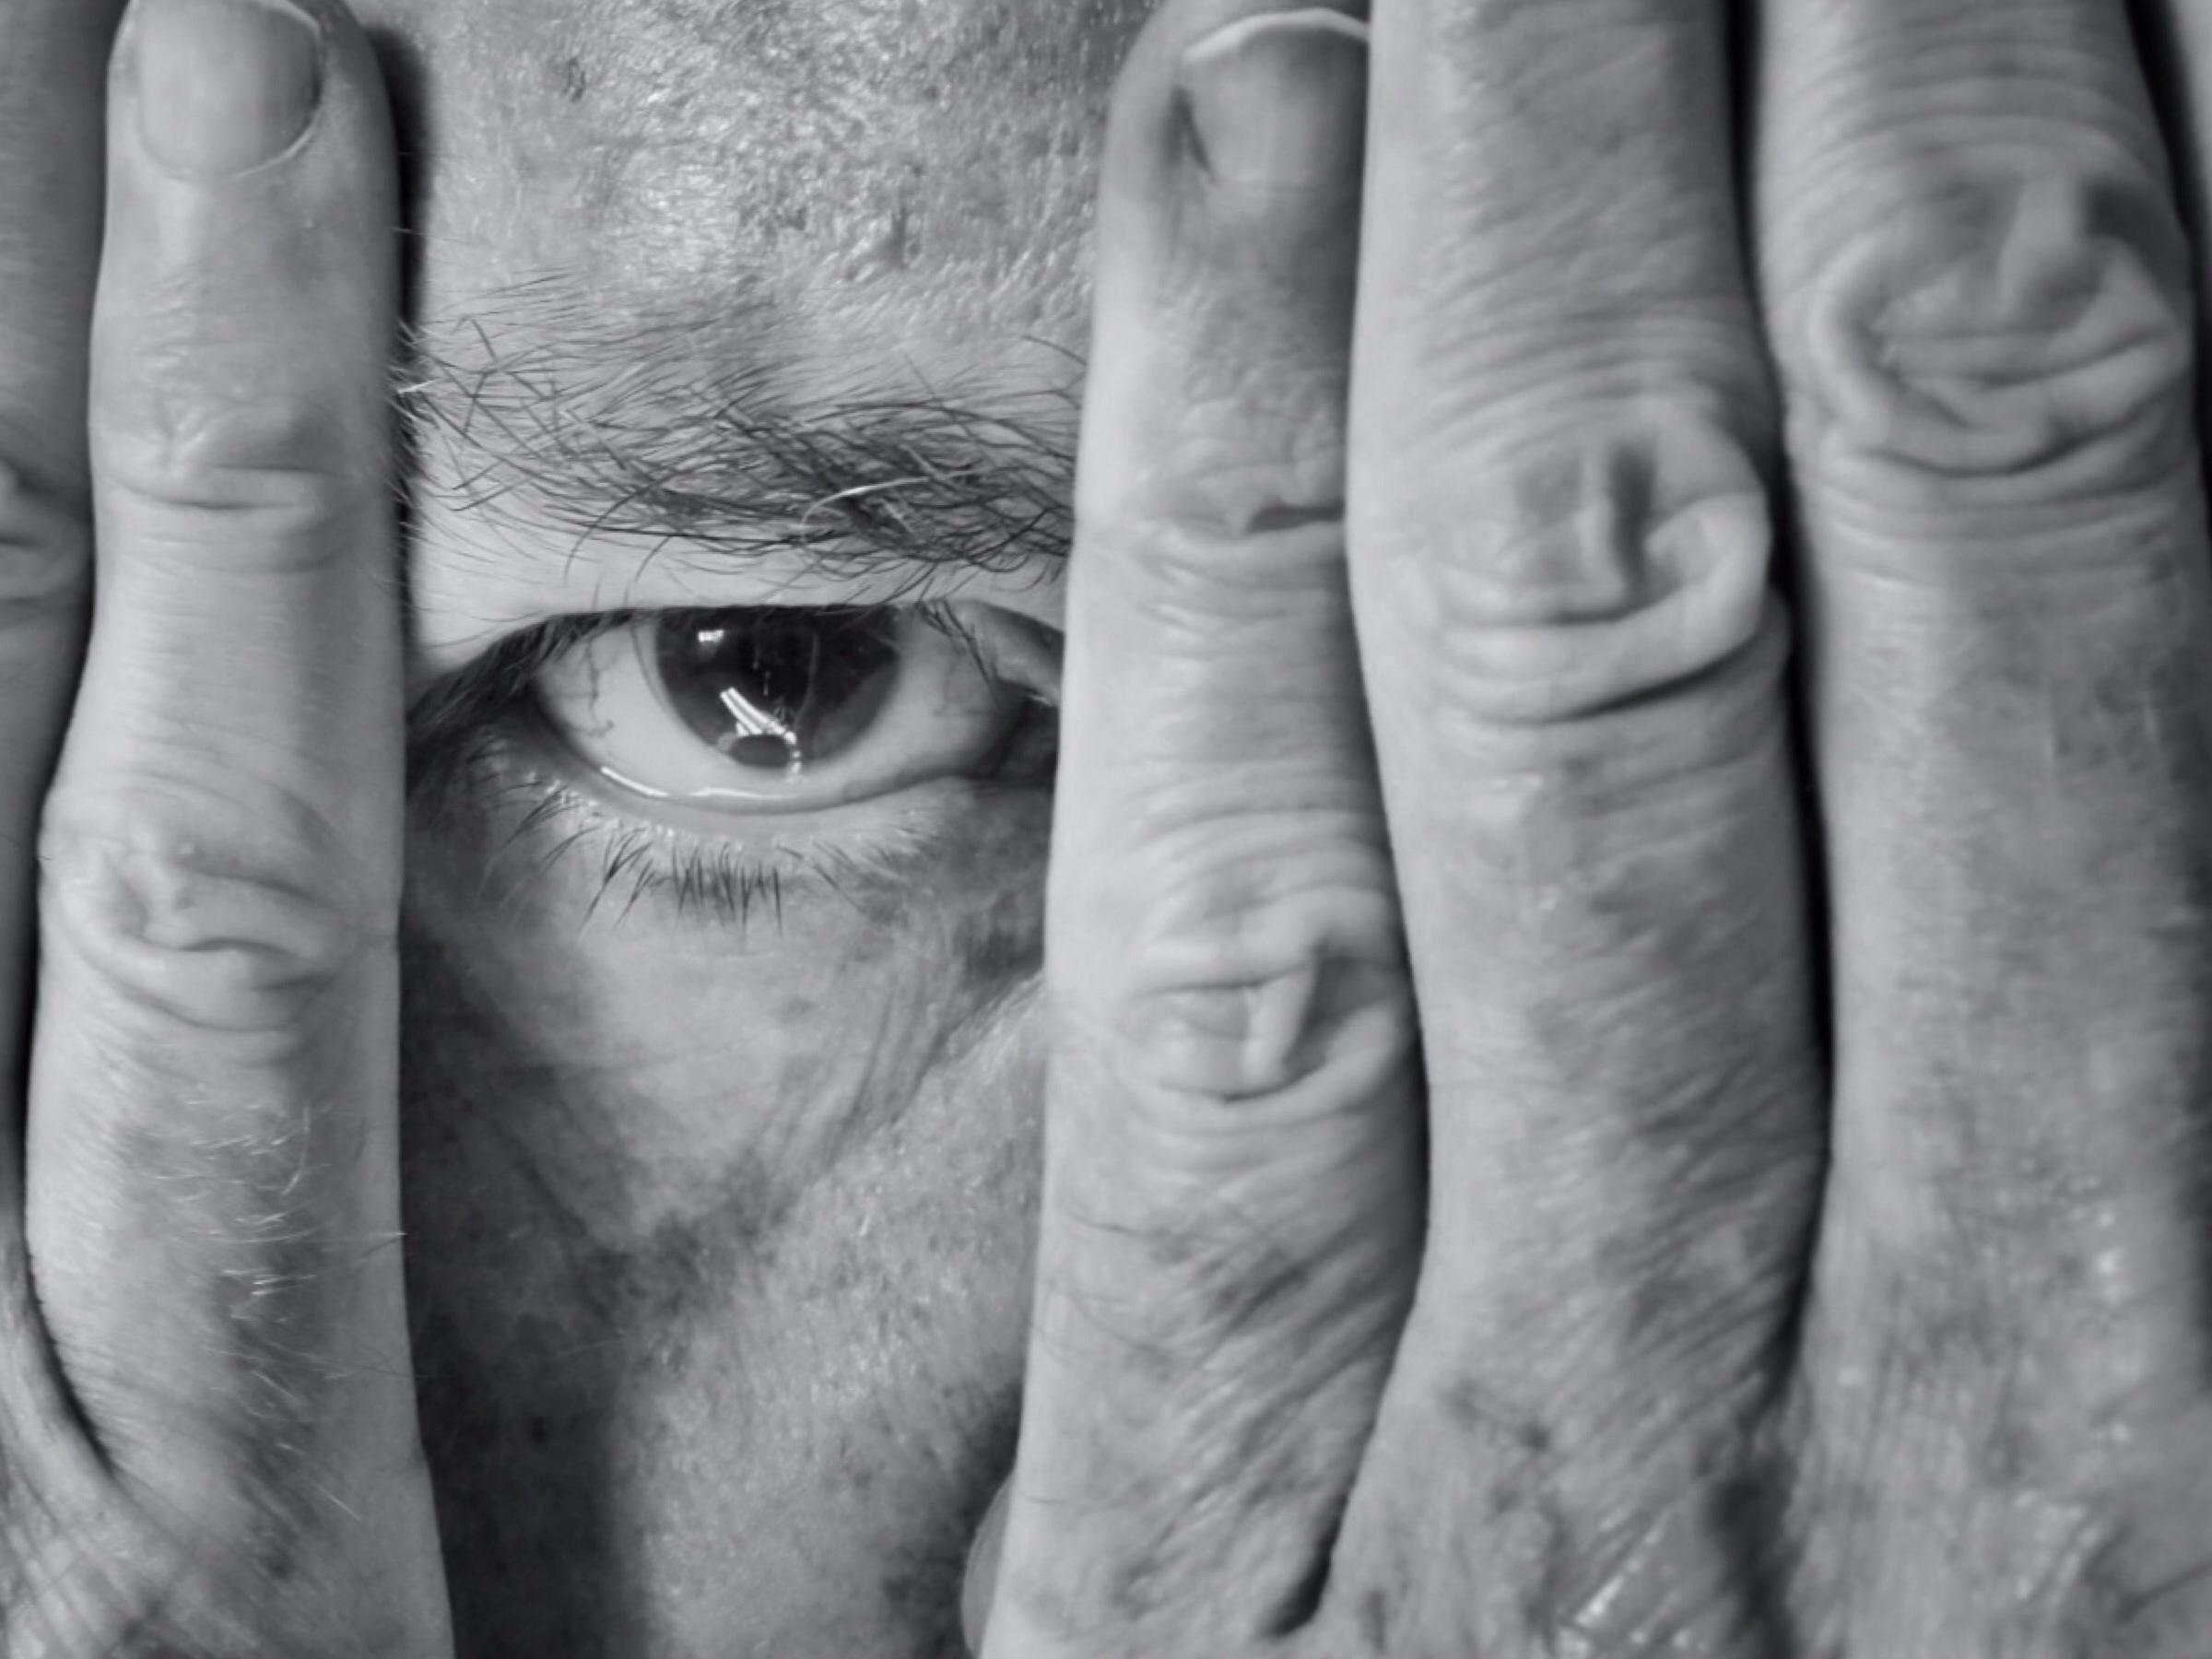 man looking thru fingers shutterstock_157833014